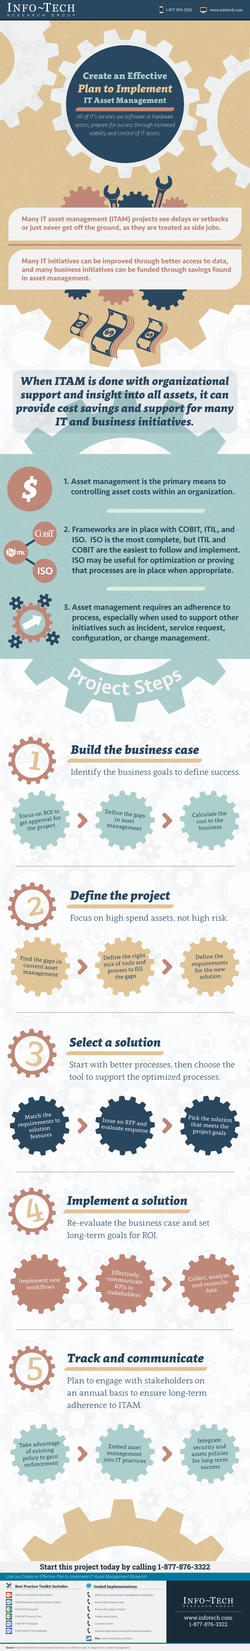 Create an Effective Plan to Implement IT Asset Management thumbnail